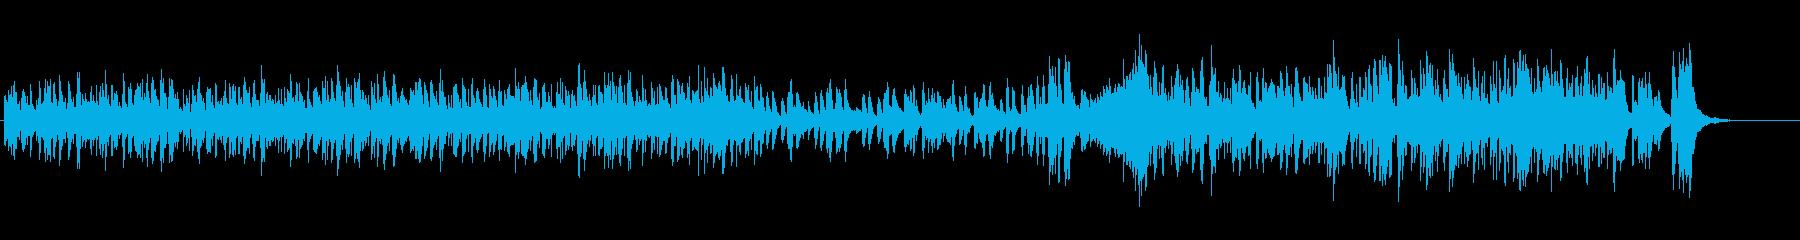 【BGM】南国/ラテン/夏/カリブ海の再生済みの波形